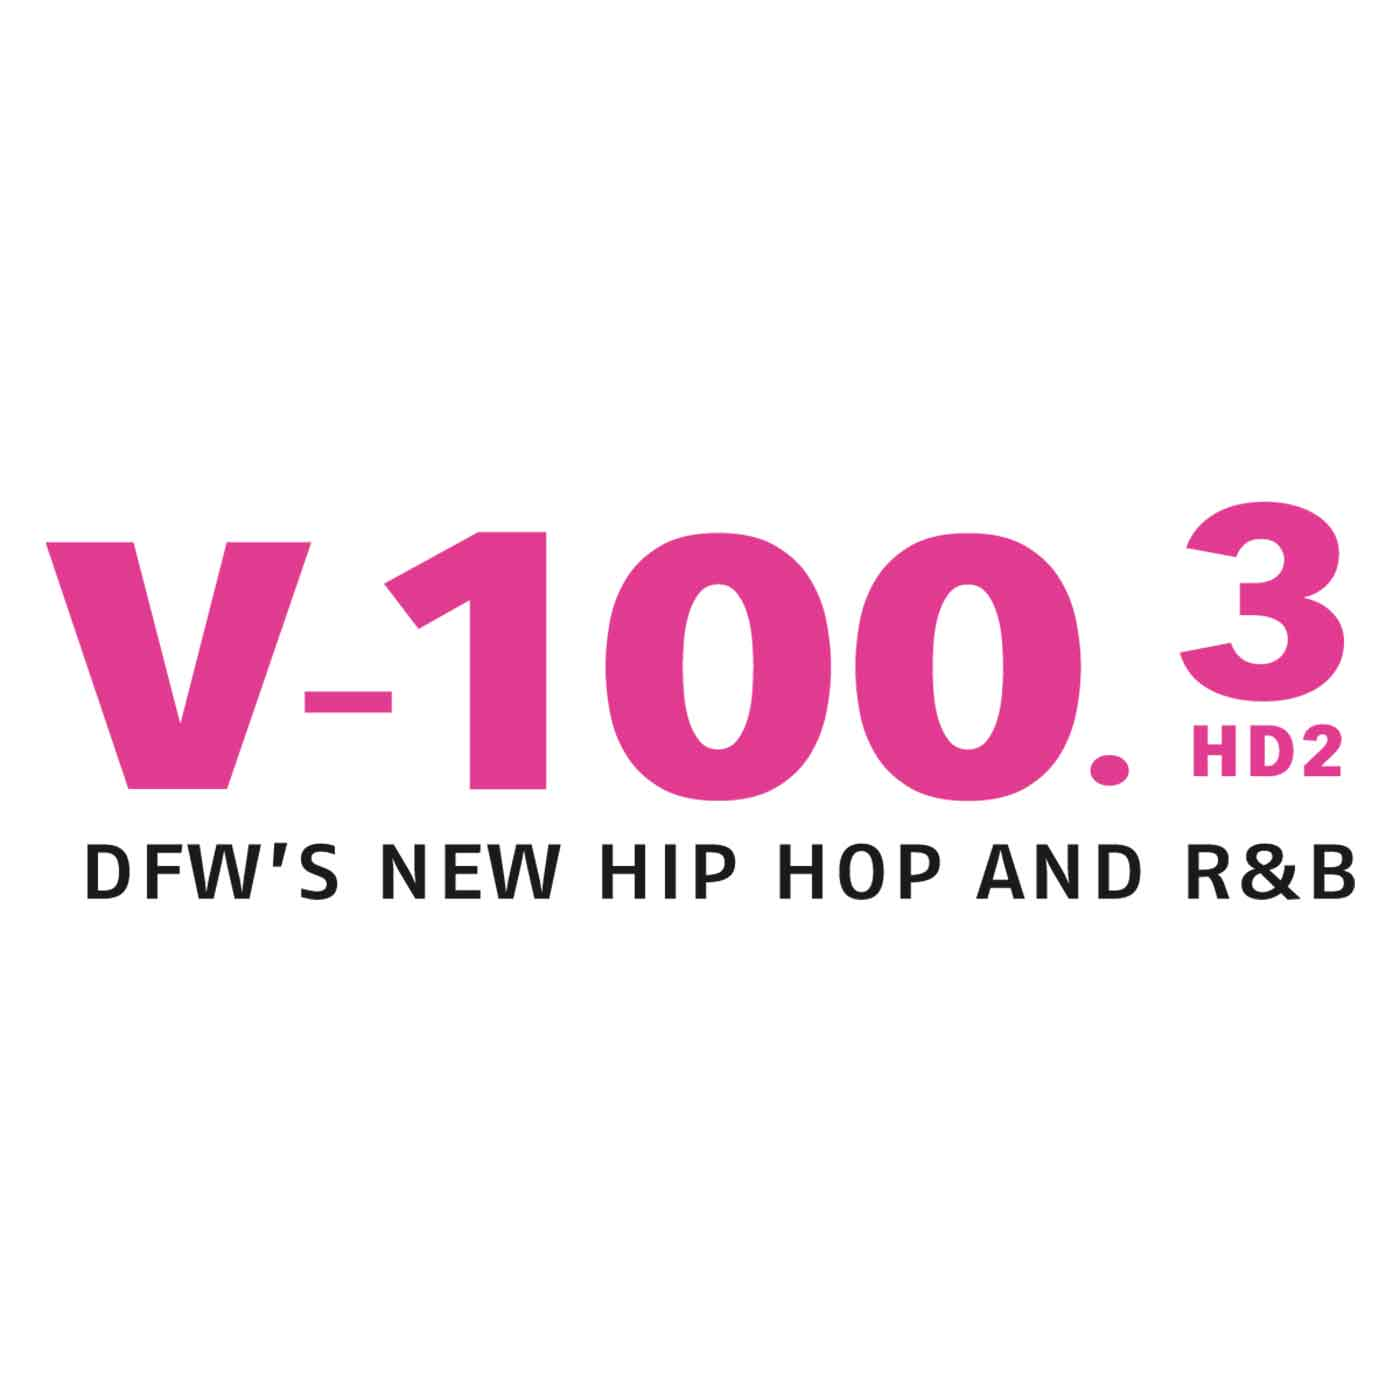 V-100.3 HD2